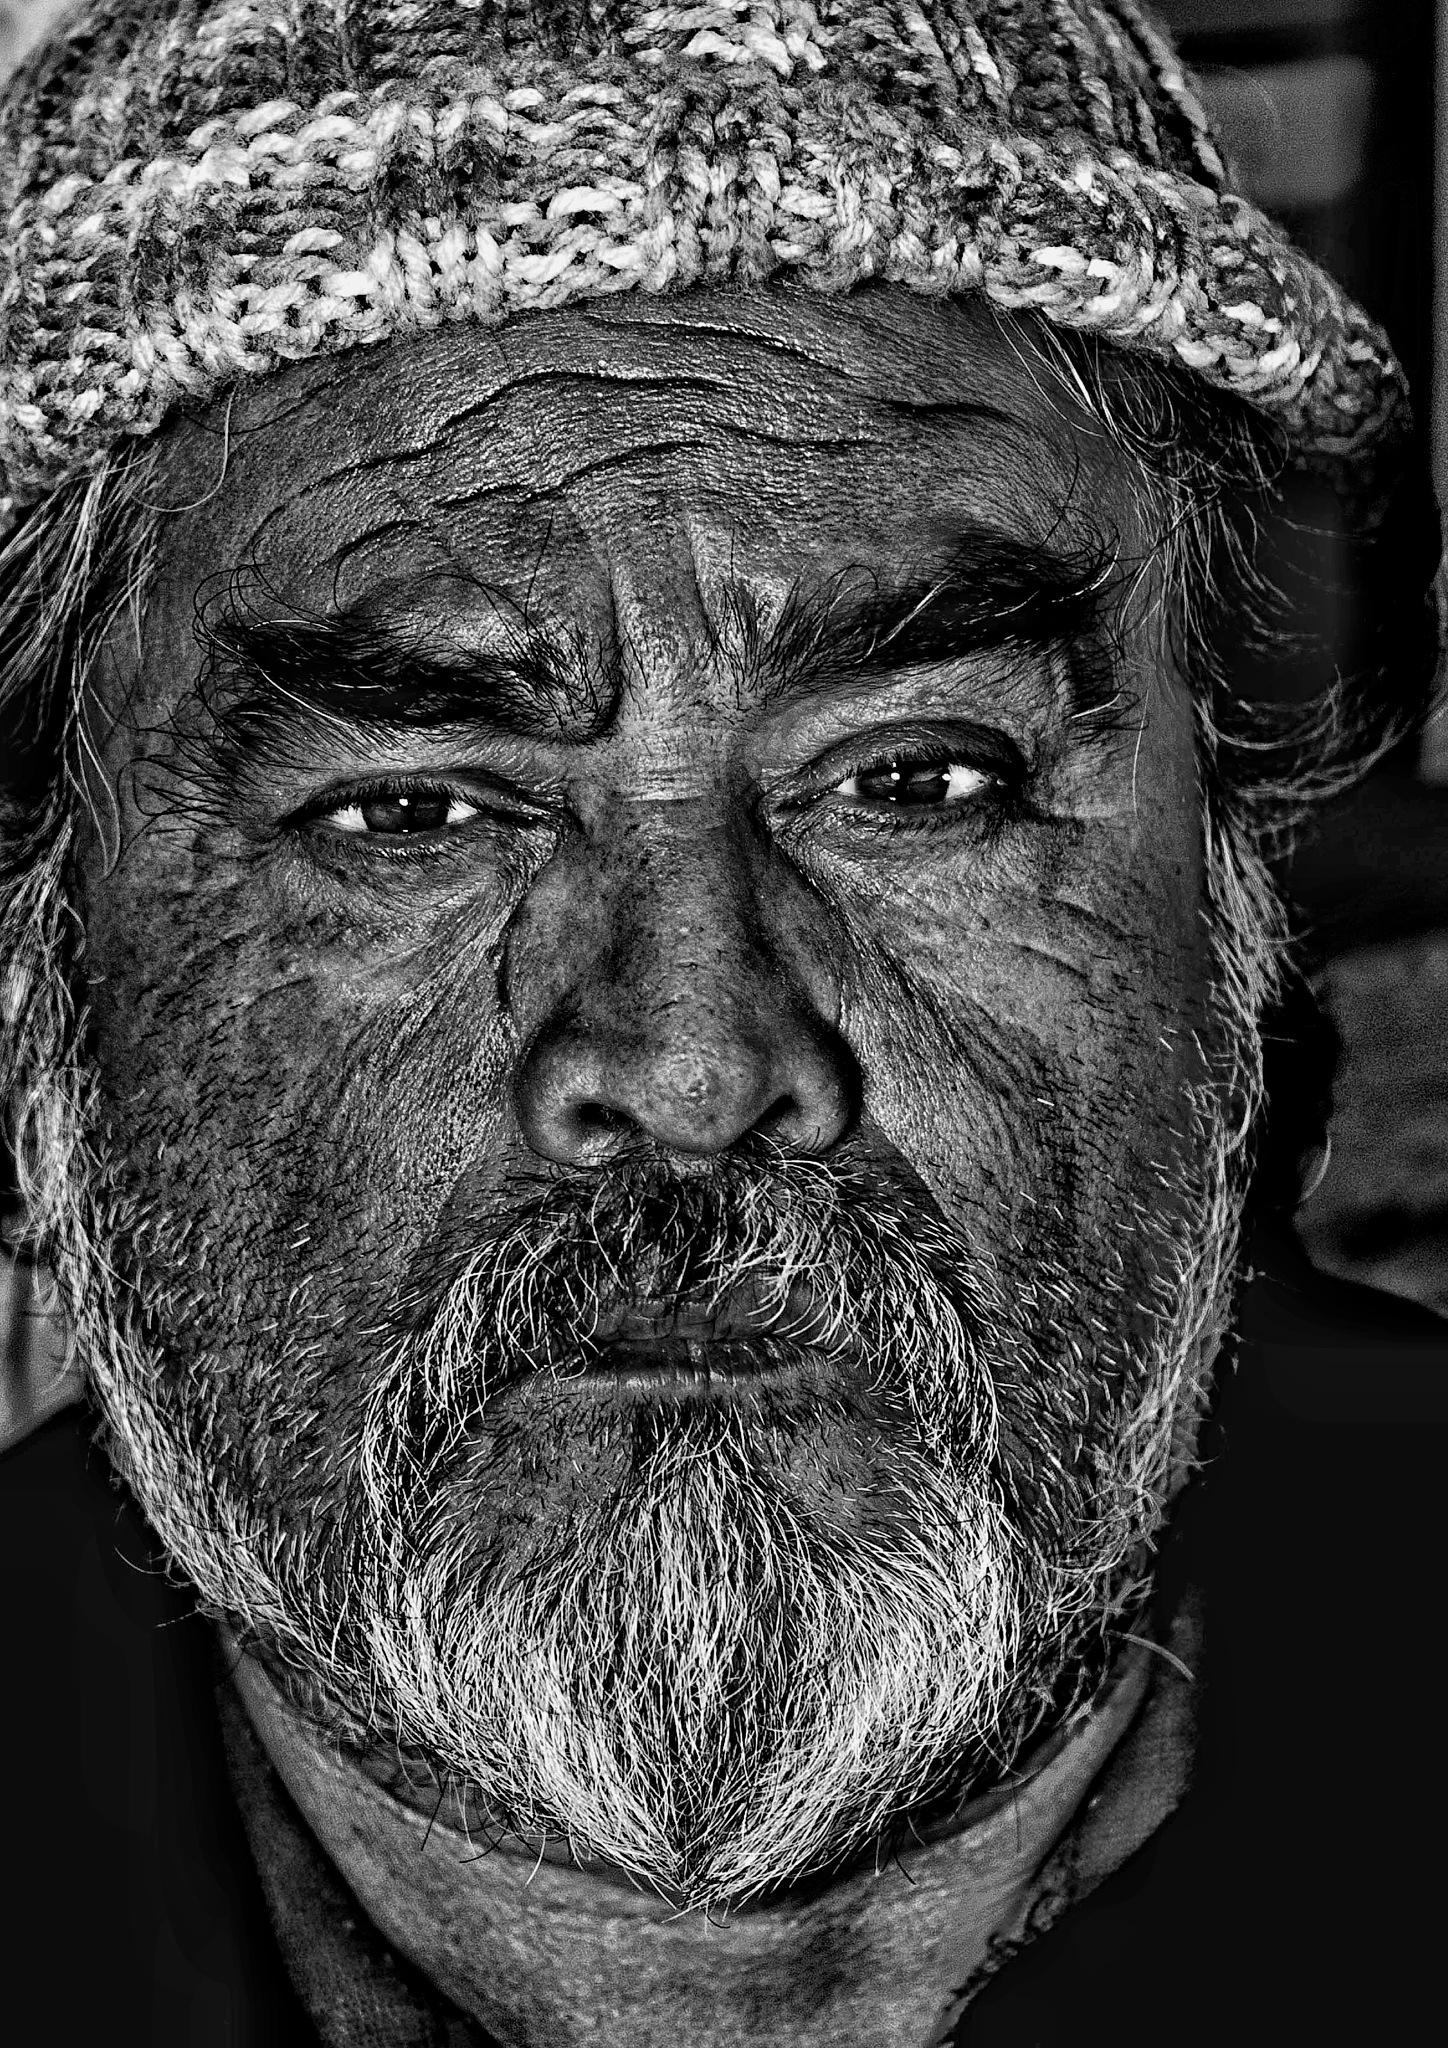 Homeless - Ernest by jphall